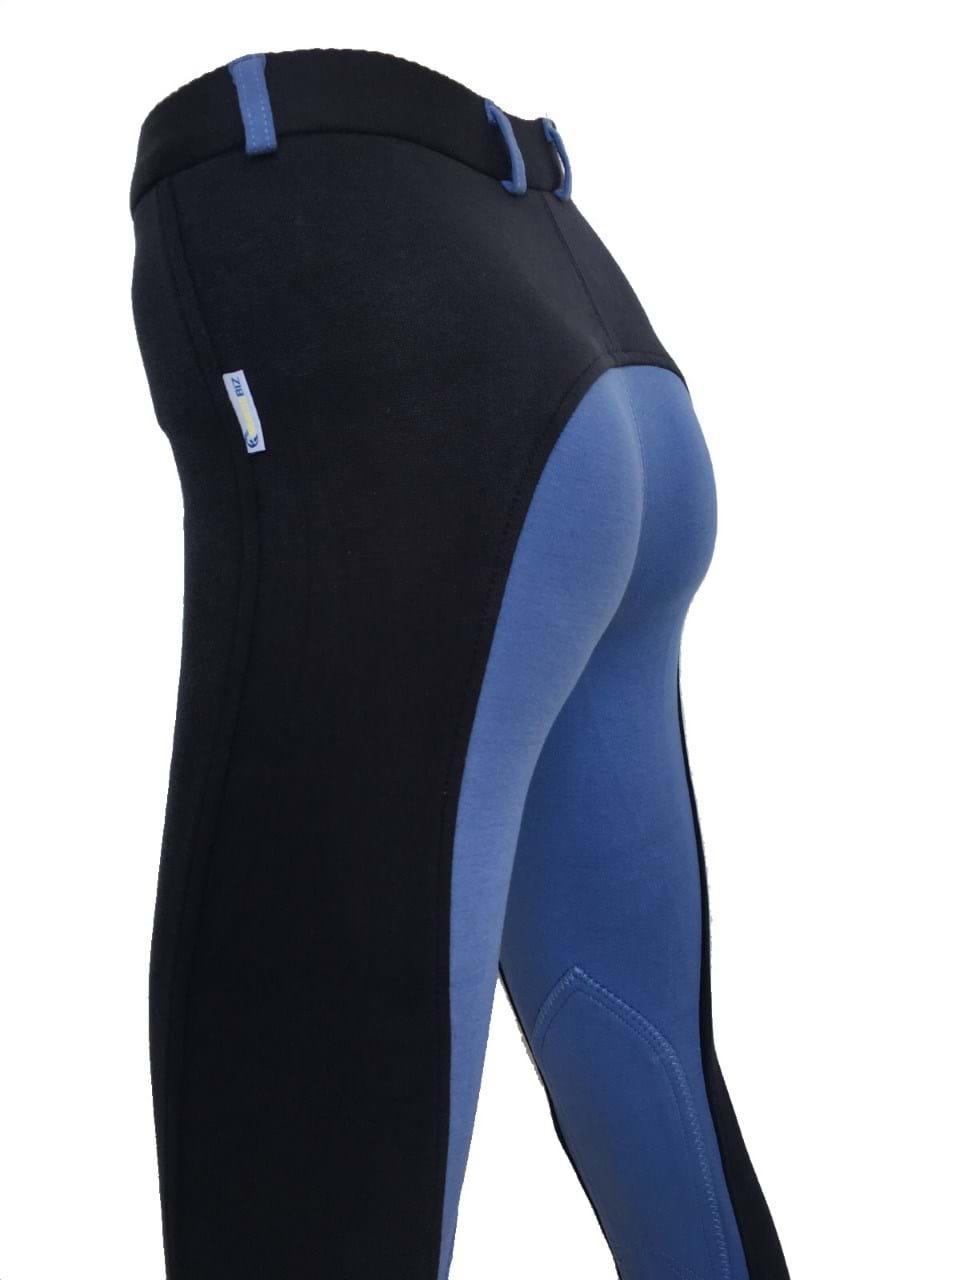 Details about Girls Blue Jodhpurs, Kids Blue Jodphurs Girls Riding Pants Sizes 6 8 10 12 14